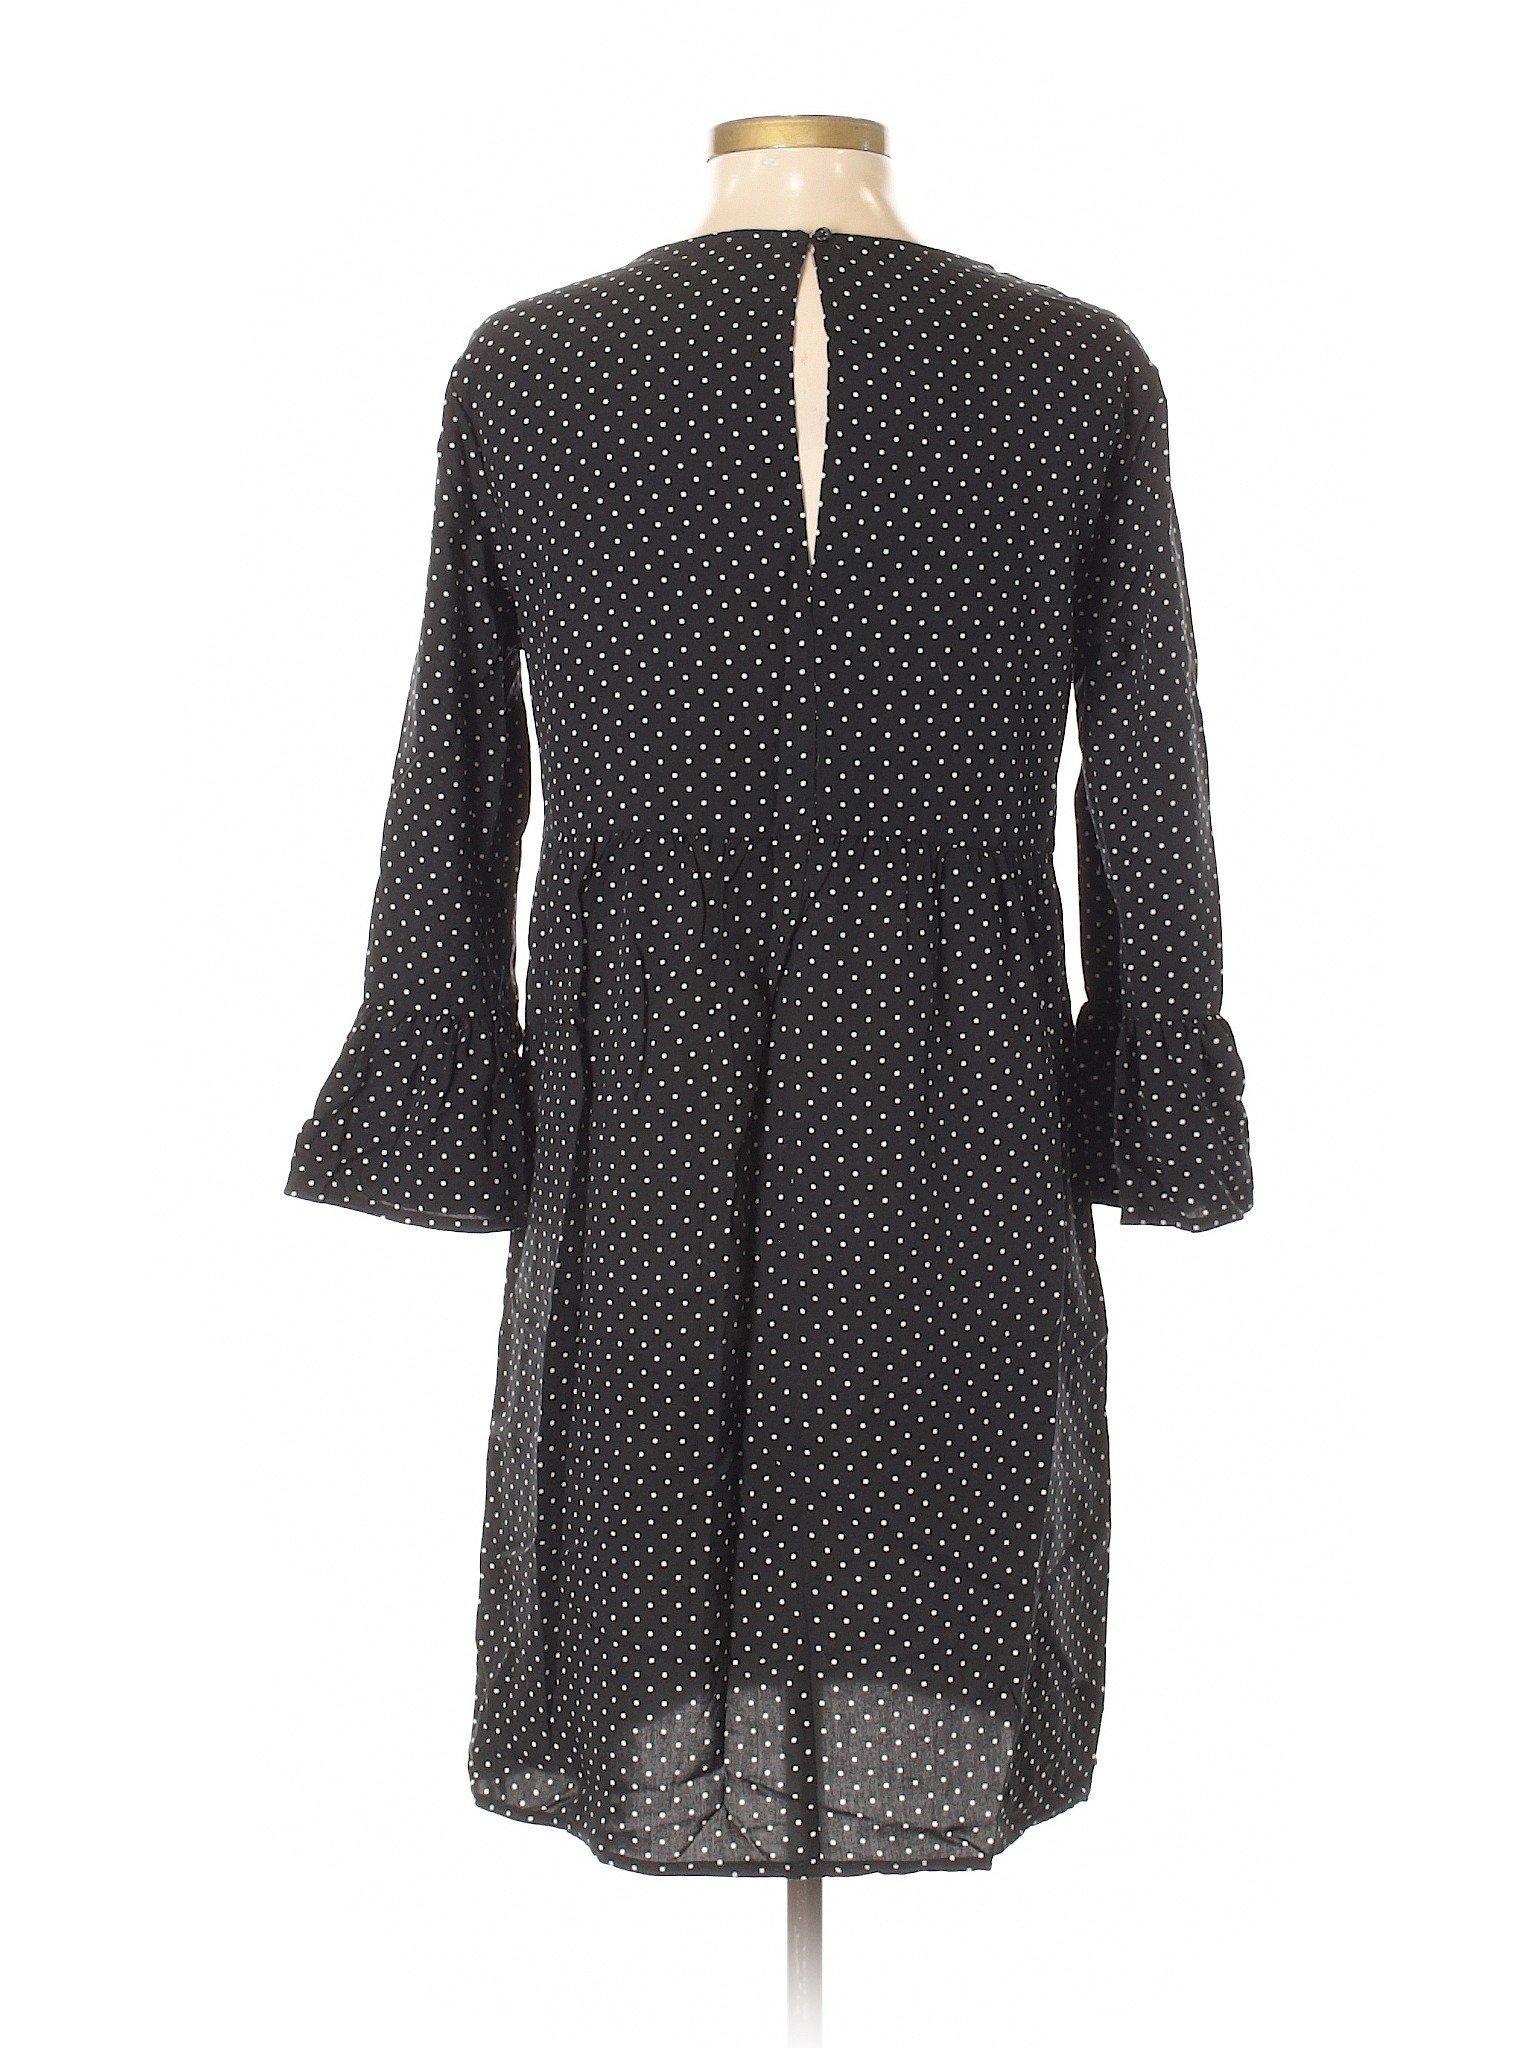 Boutique Navy Dress winter Casual Old qFa1xwnqRv